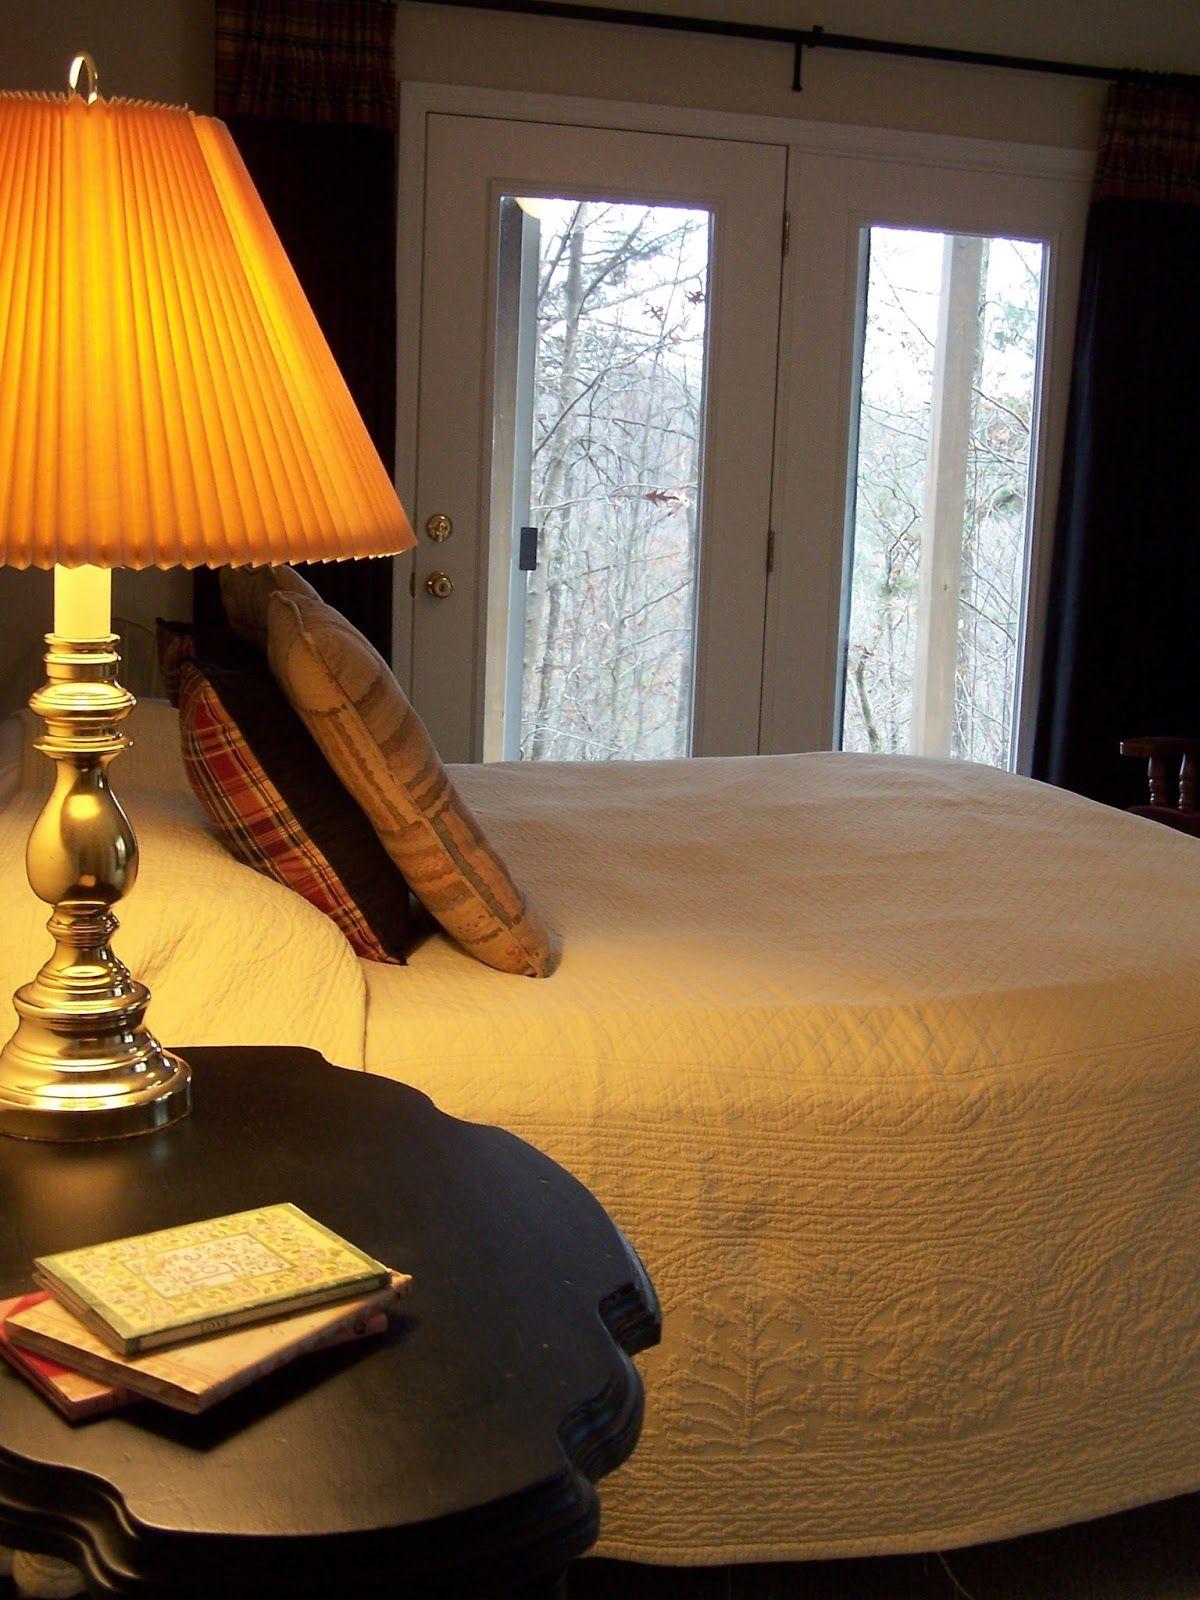 Staging Tips Tara Dillard Rental Success Flipkey, Airbnb, Homeaway, Vrbo,